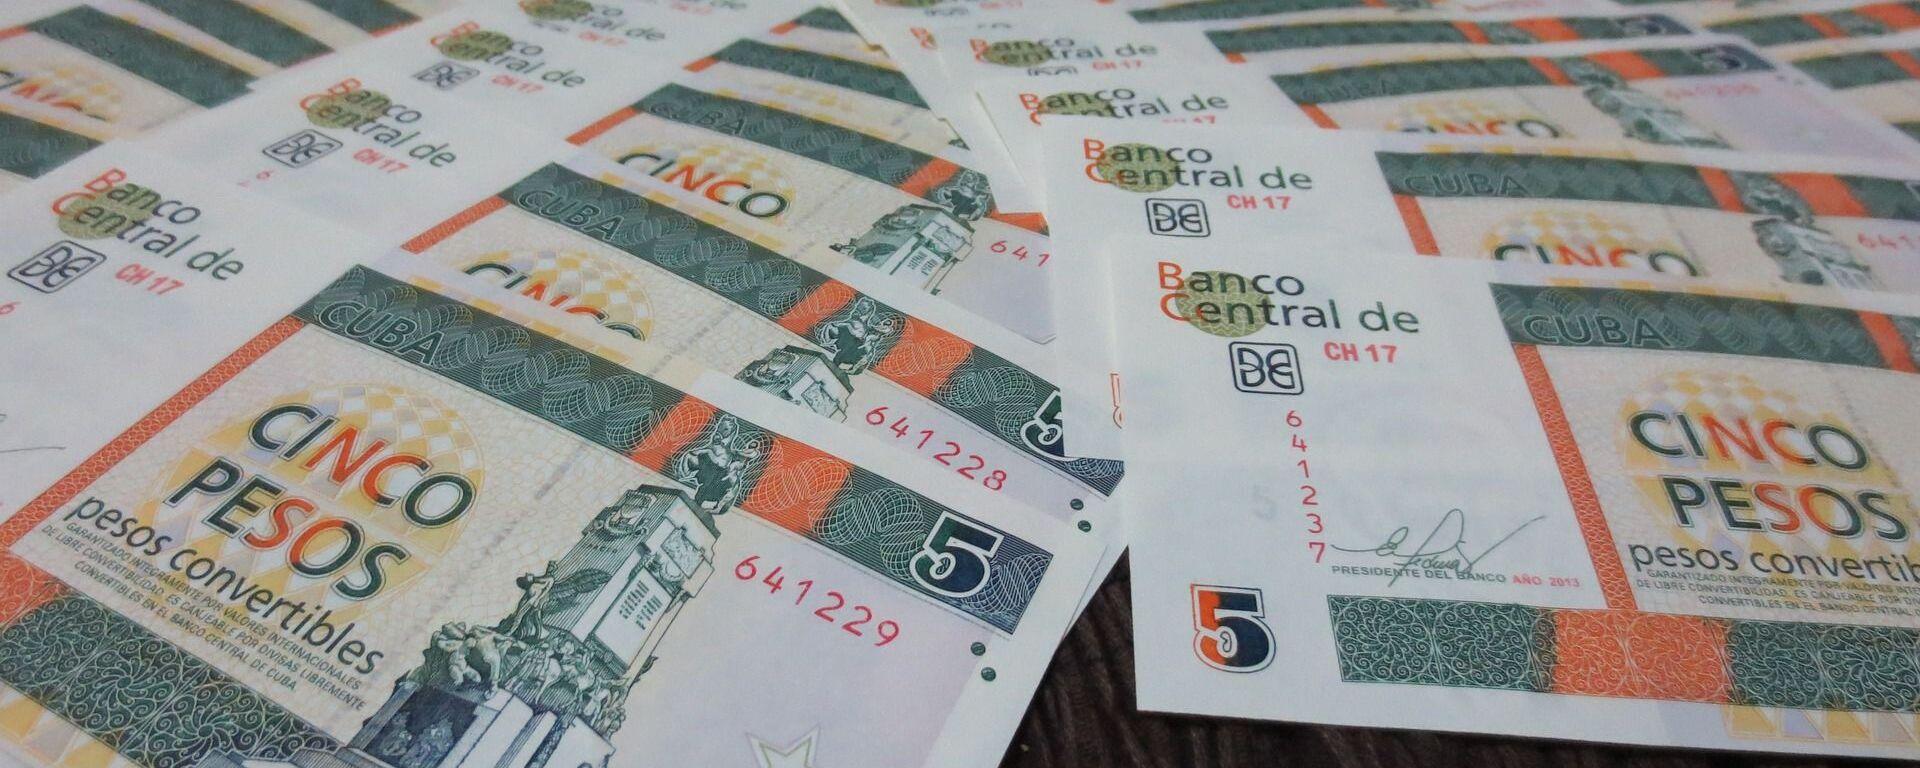 Billetes de pesos cubanos convertibles - imagen referencial - Sputnik Mundo, 1920, 15.03.2021